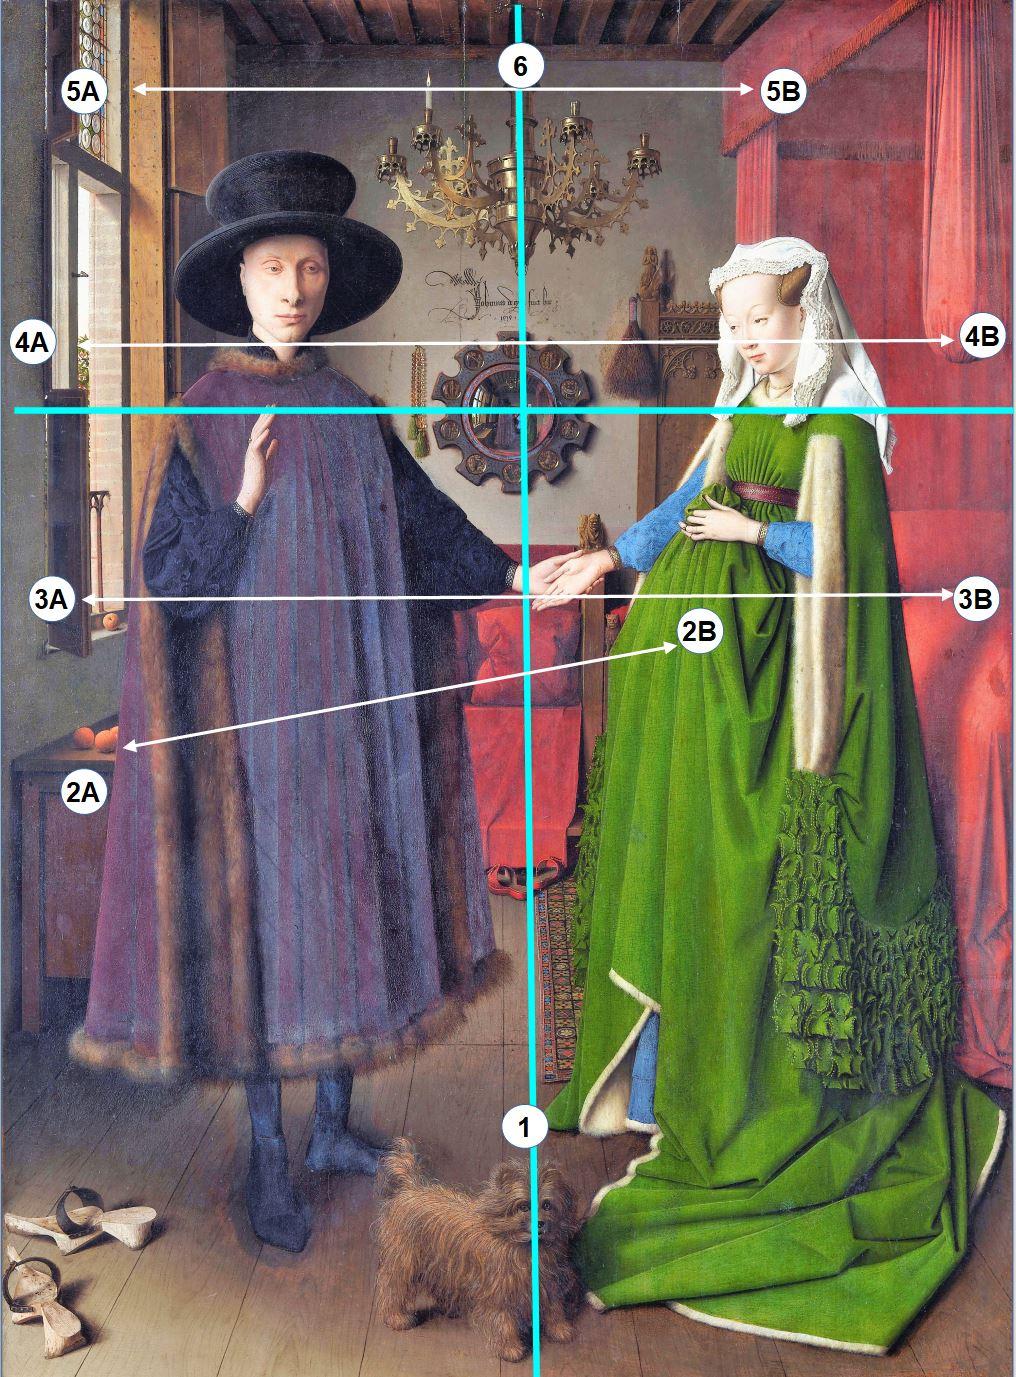 Van_Eyck 1434 _Arnolfini_Portrait symetries piece